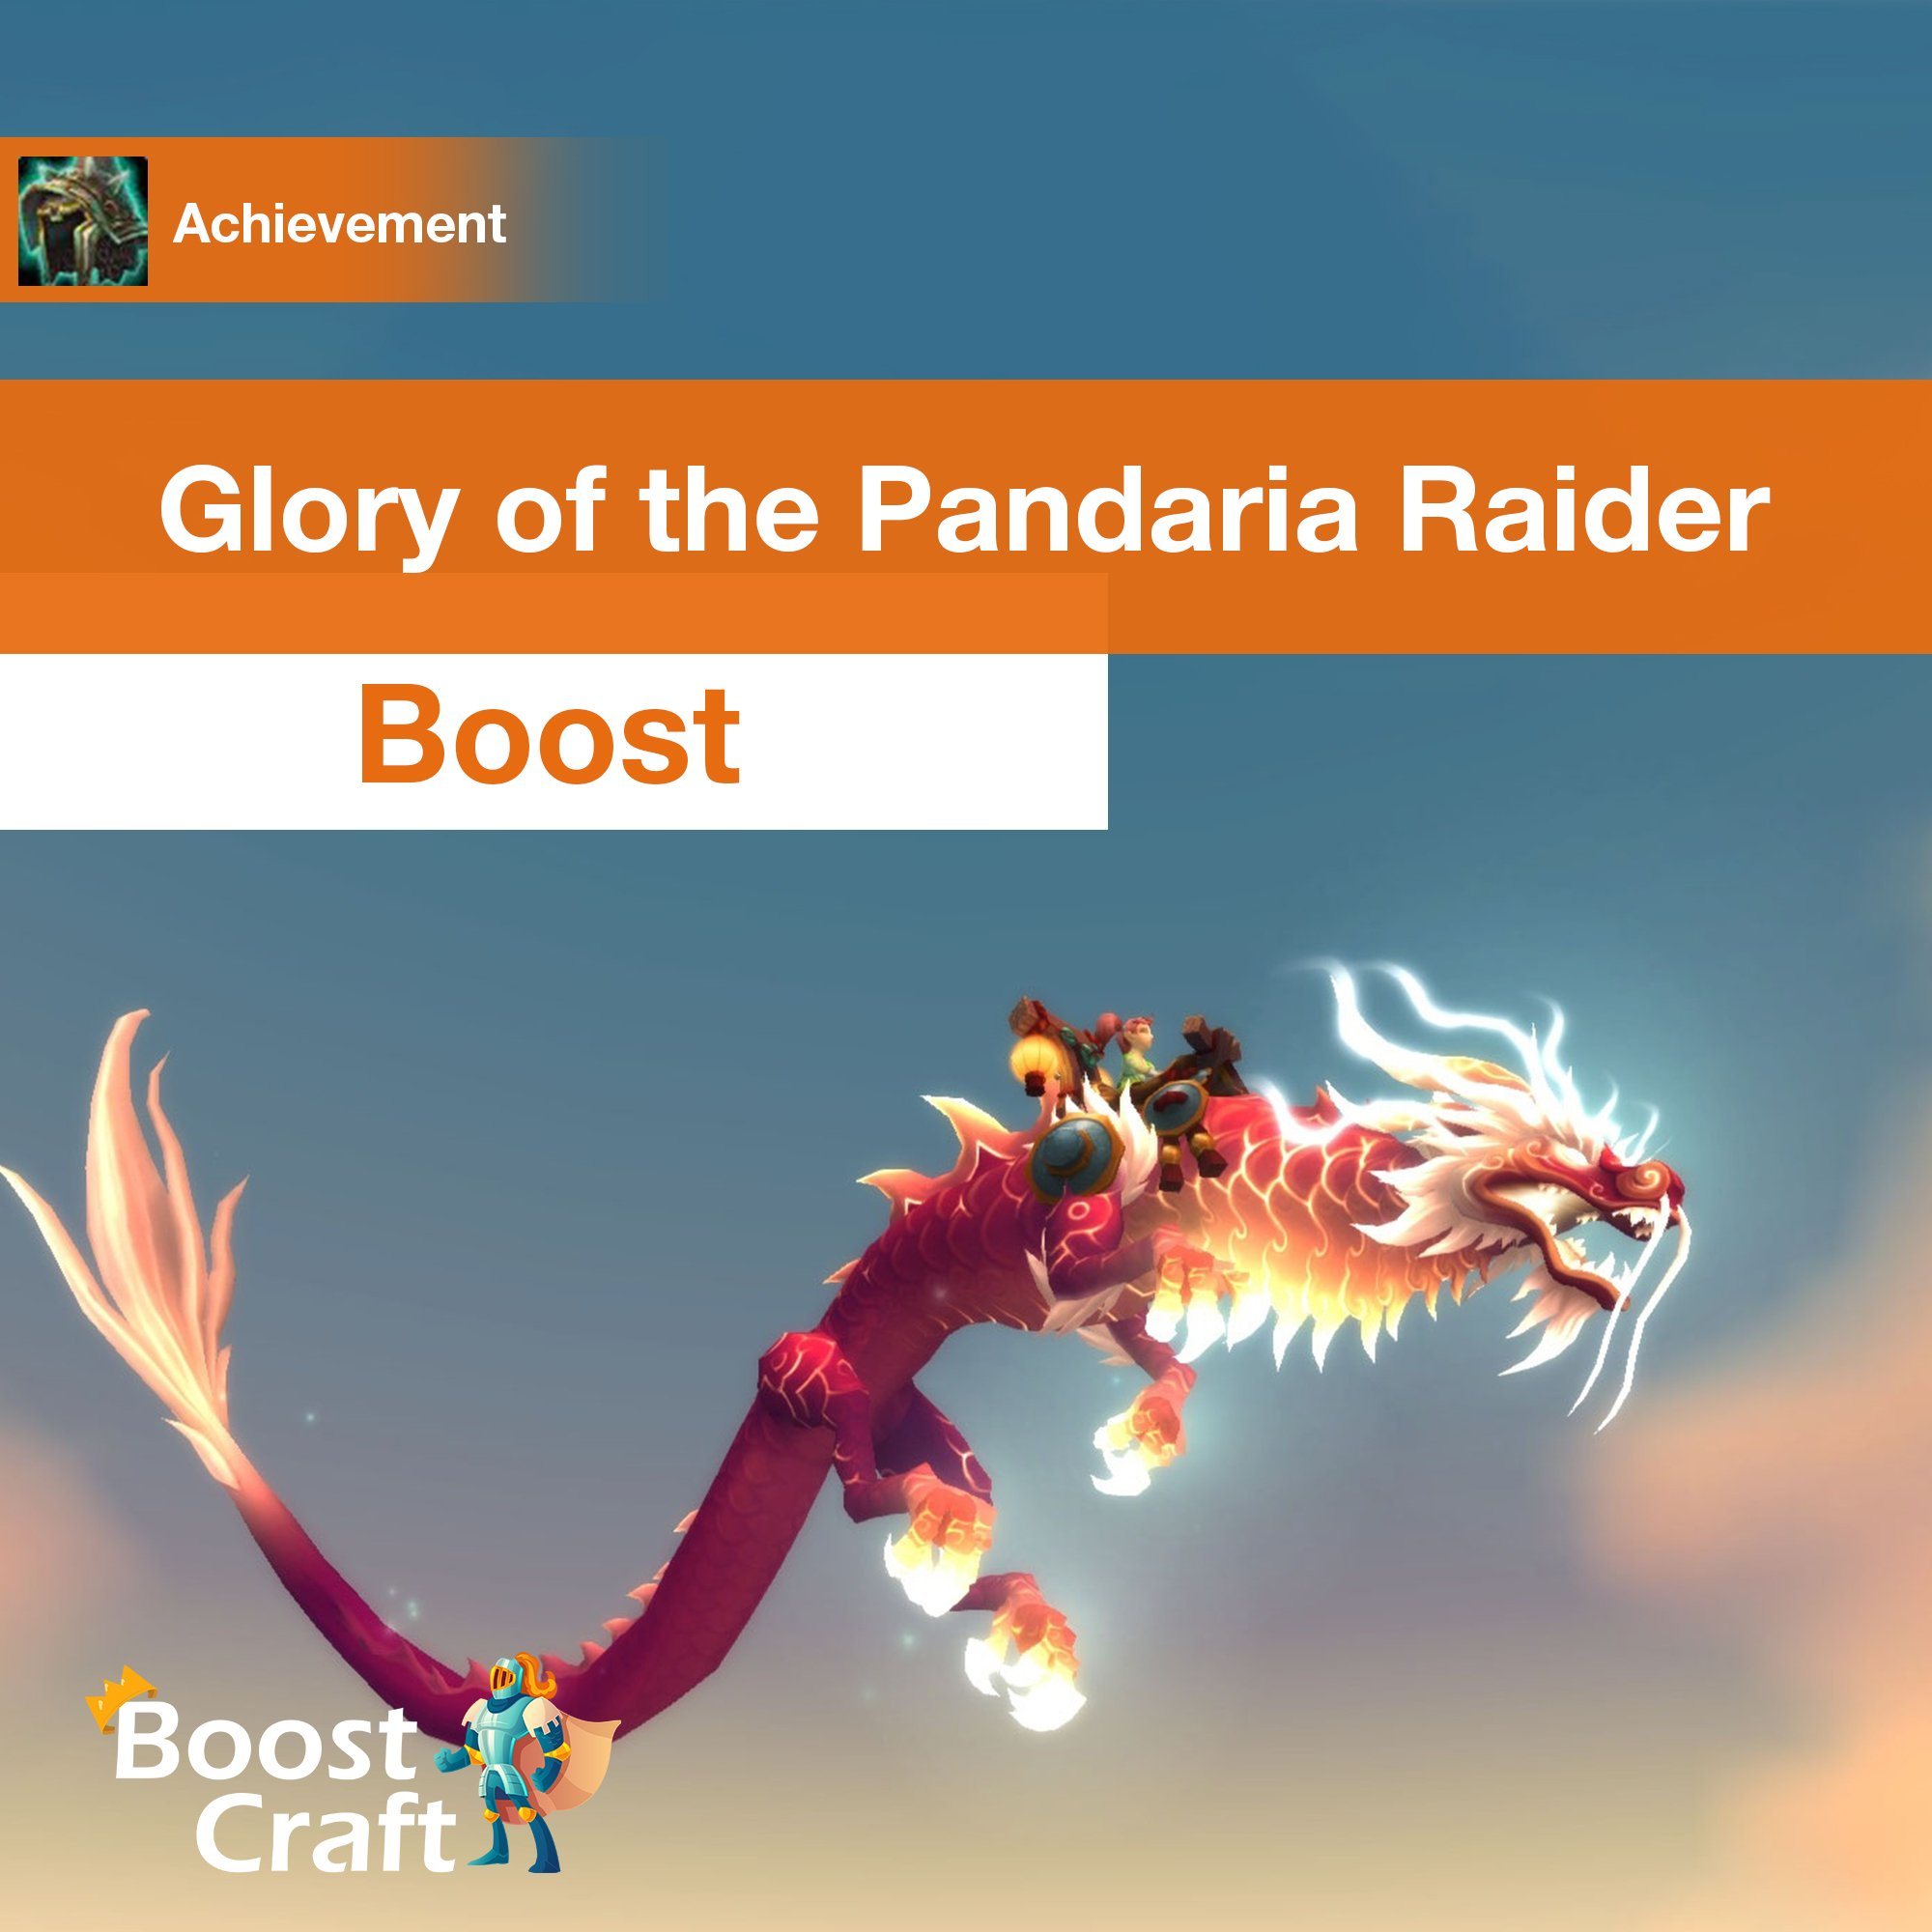 [Glory of the Pandaria Raider] Boost